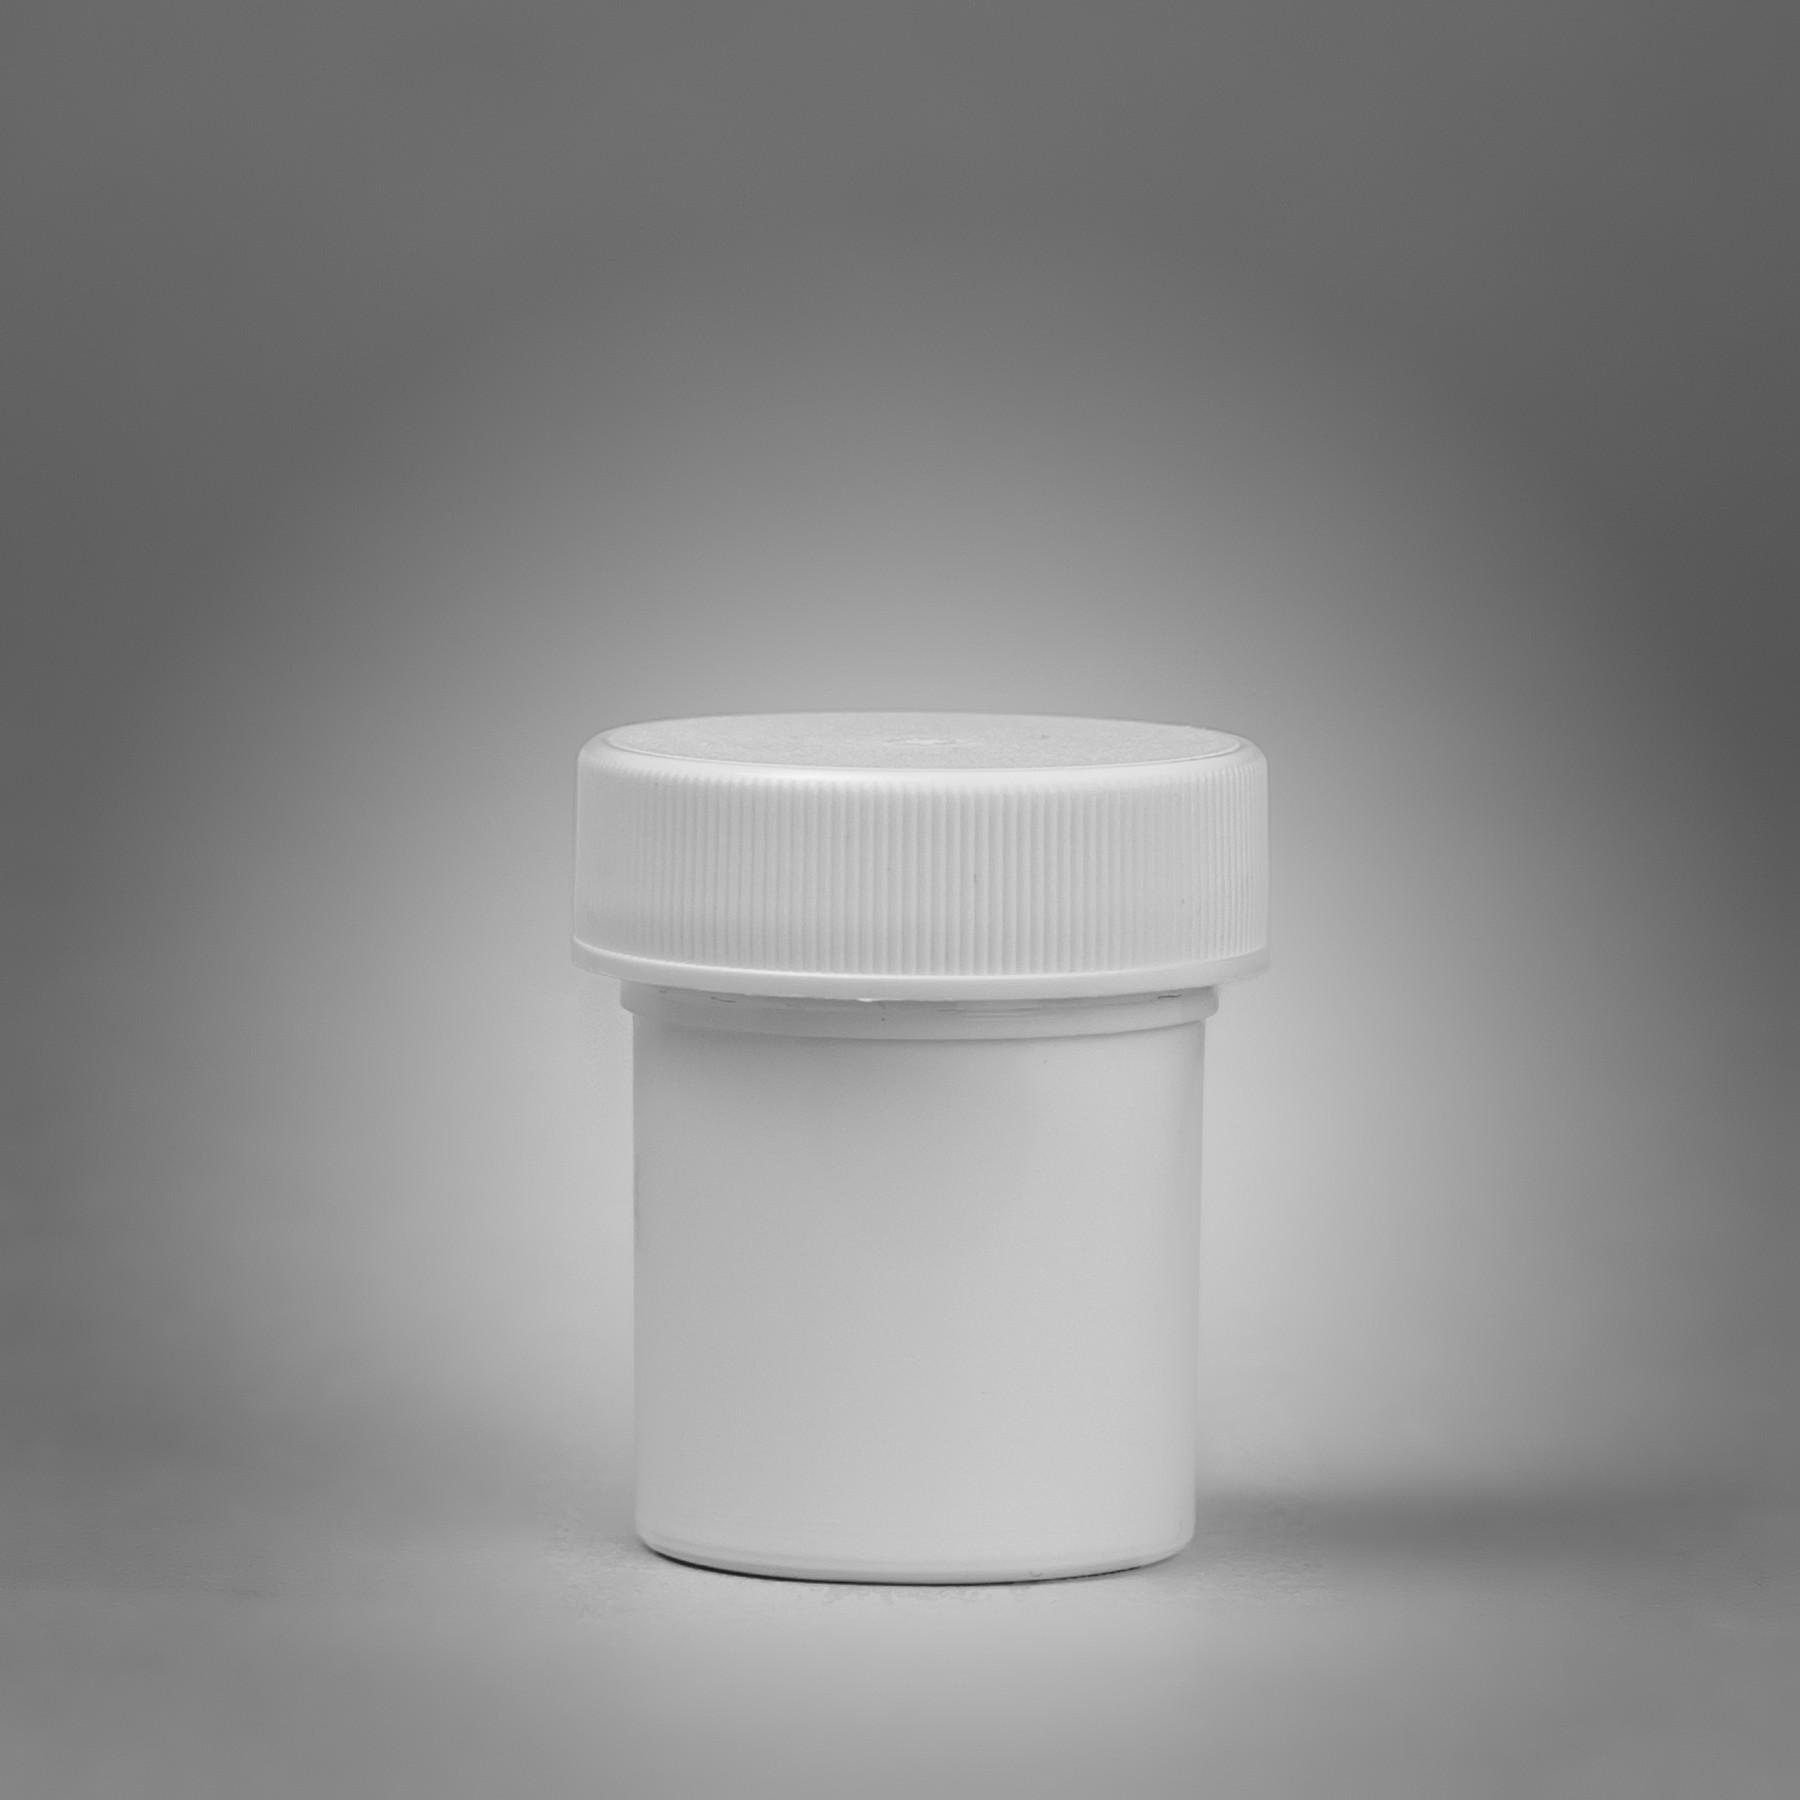 SP Bel-Art Screw Cap 29.6ml (1oz) Polypropylene Jars; 43mm Closure (Pack of 12)